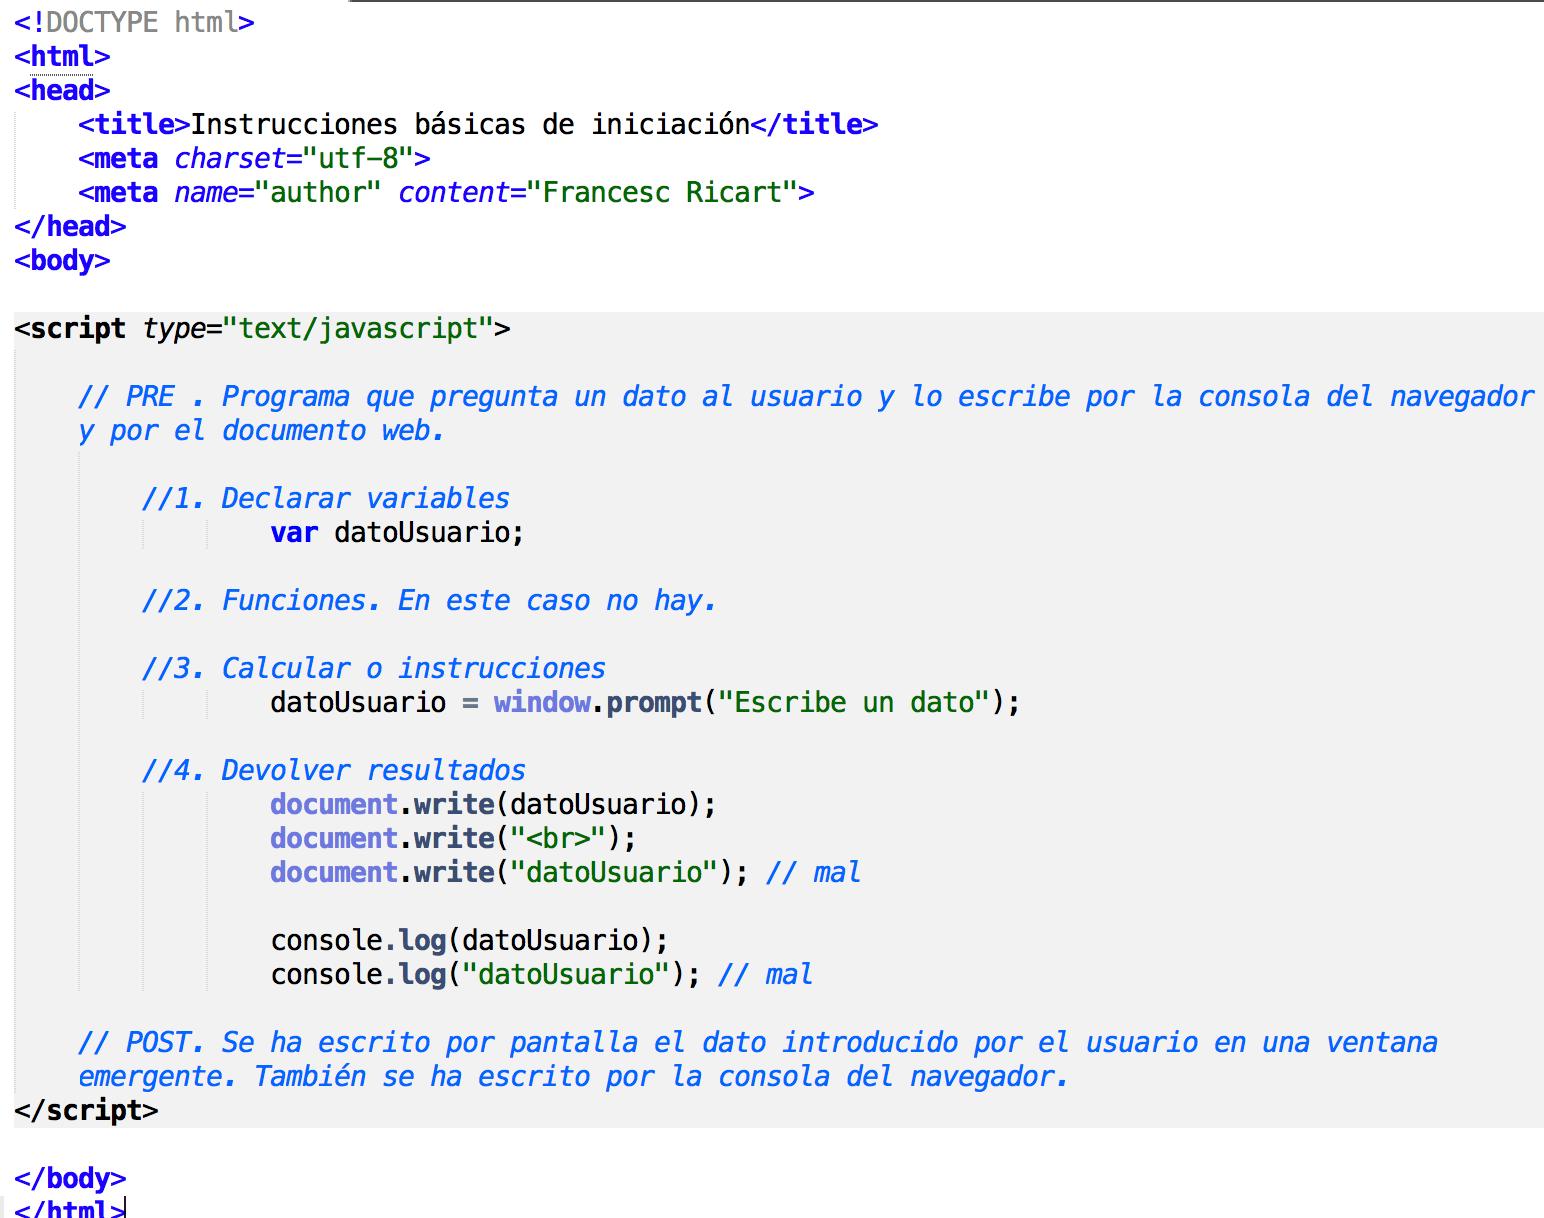 instrucciones elementales de javascript